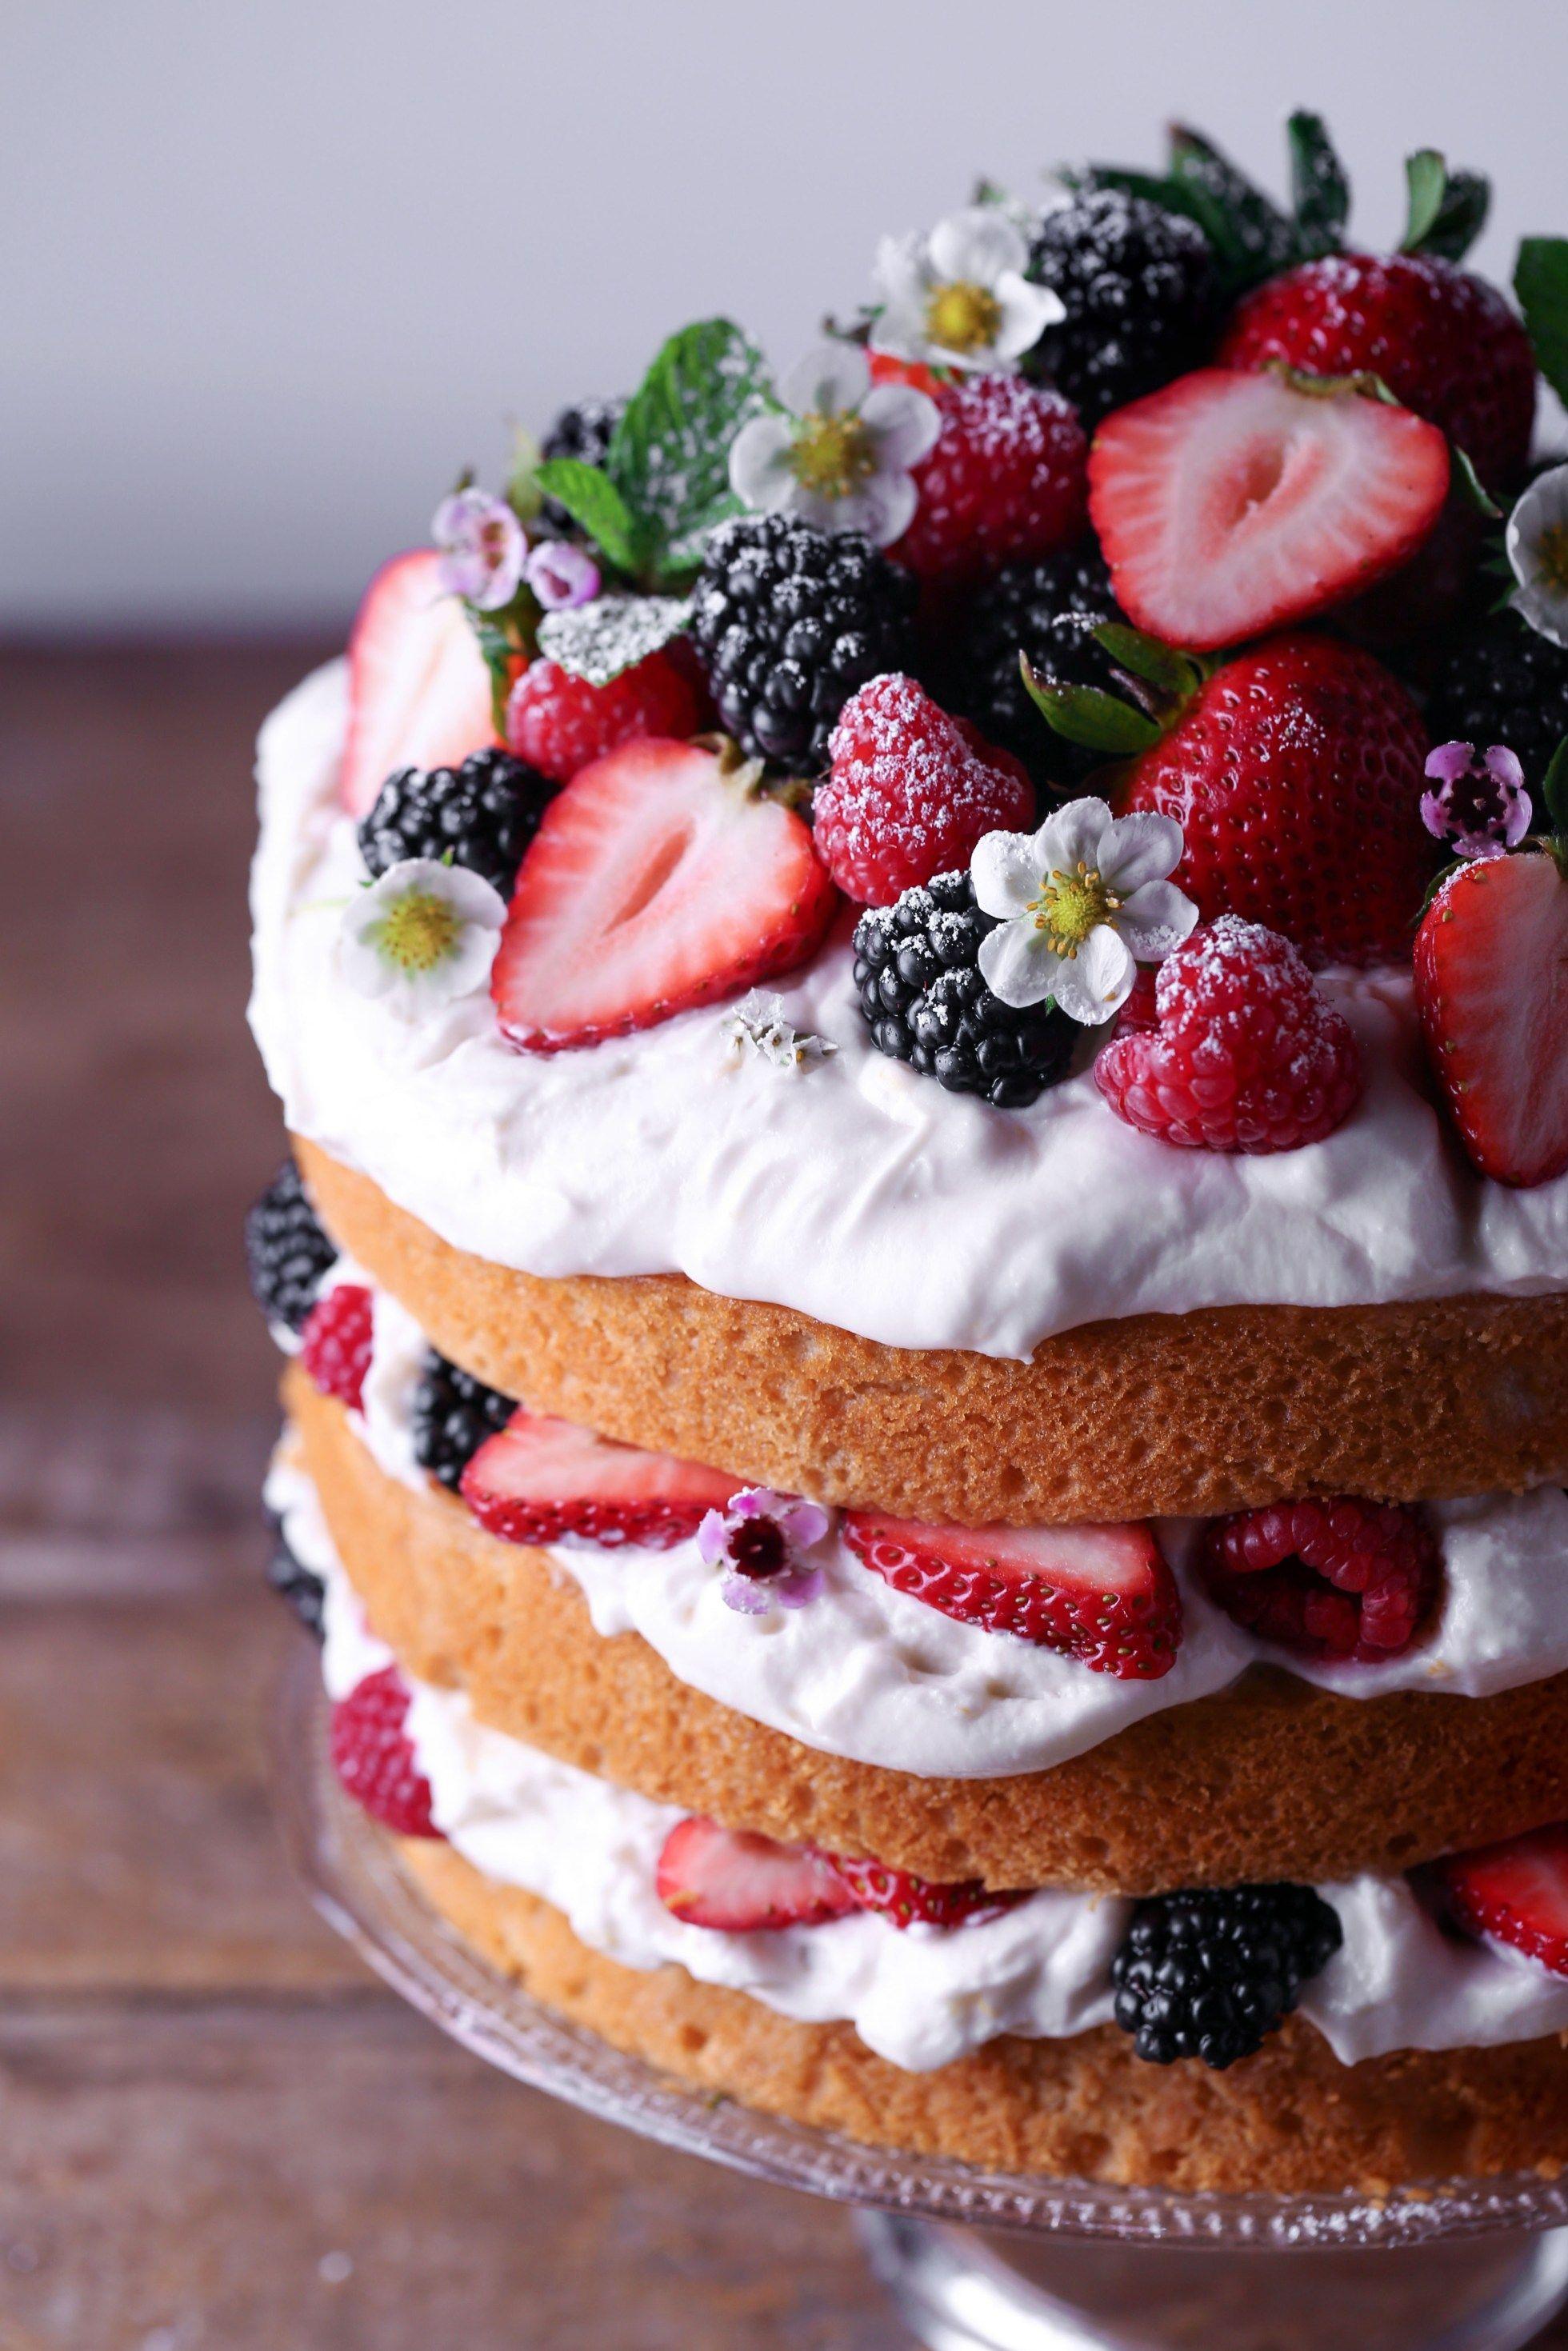 Lemon Cake with Lemon Whipped Cream and Berries